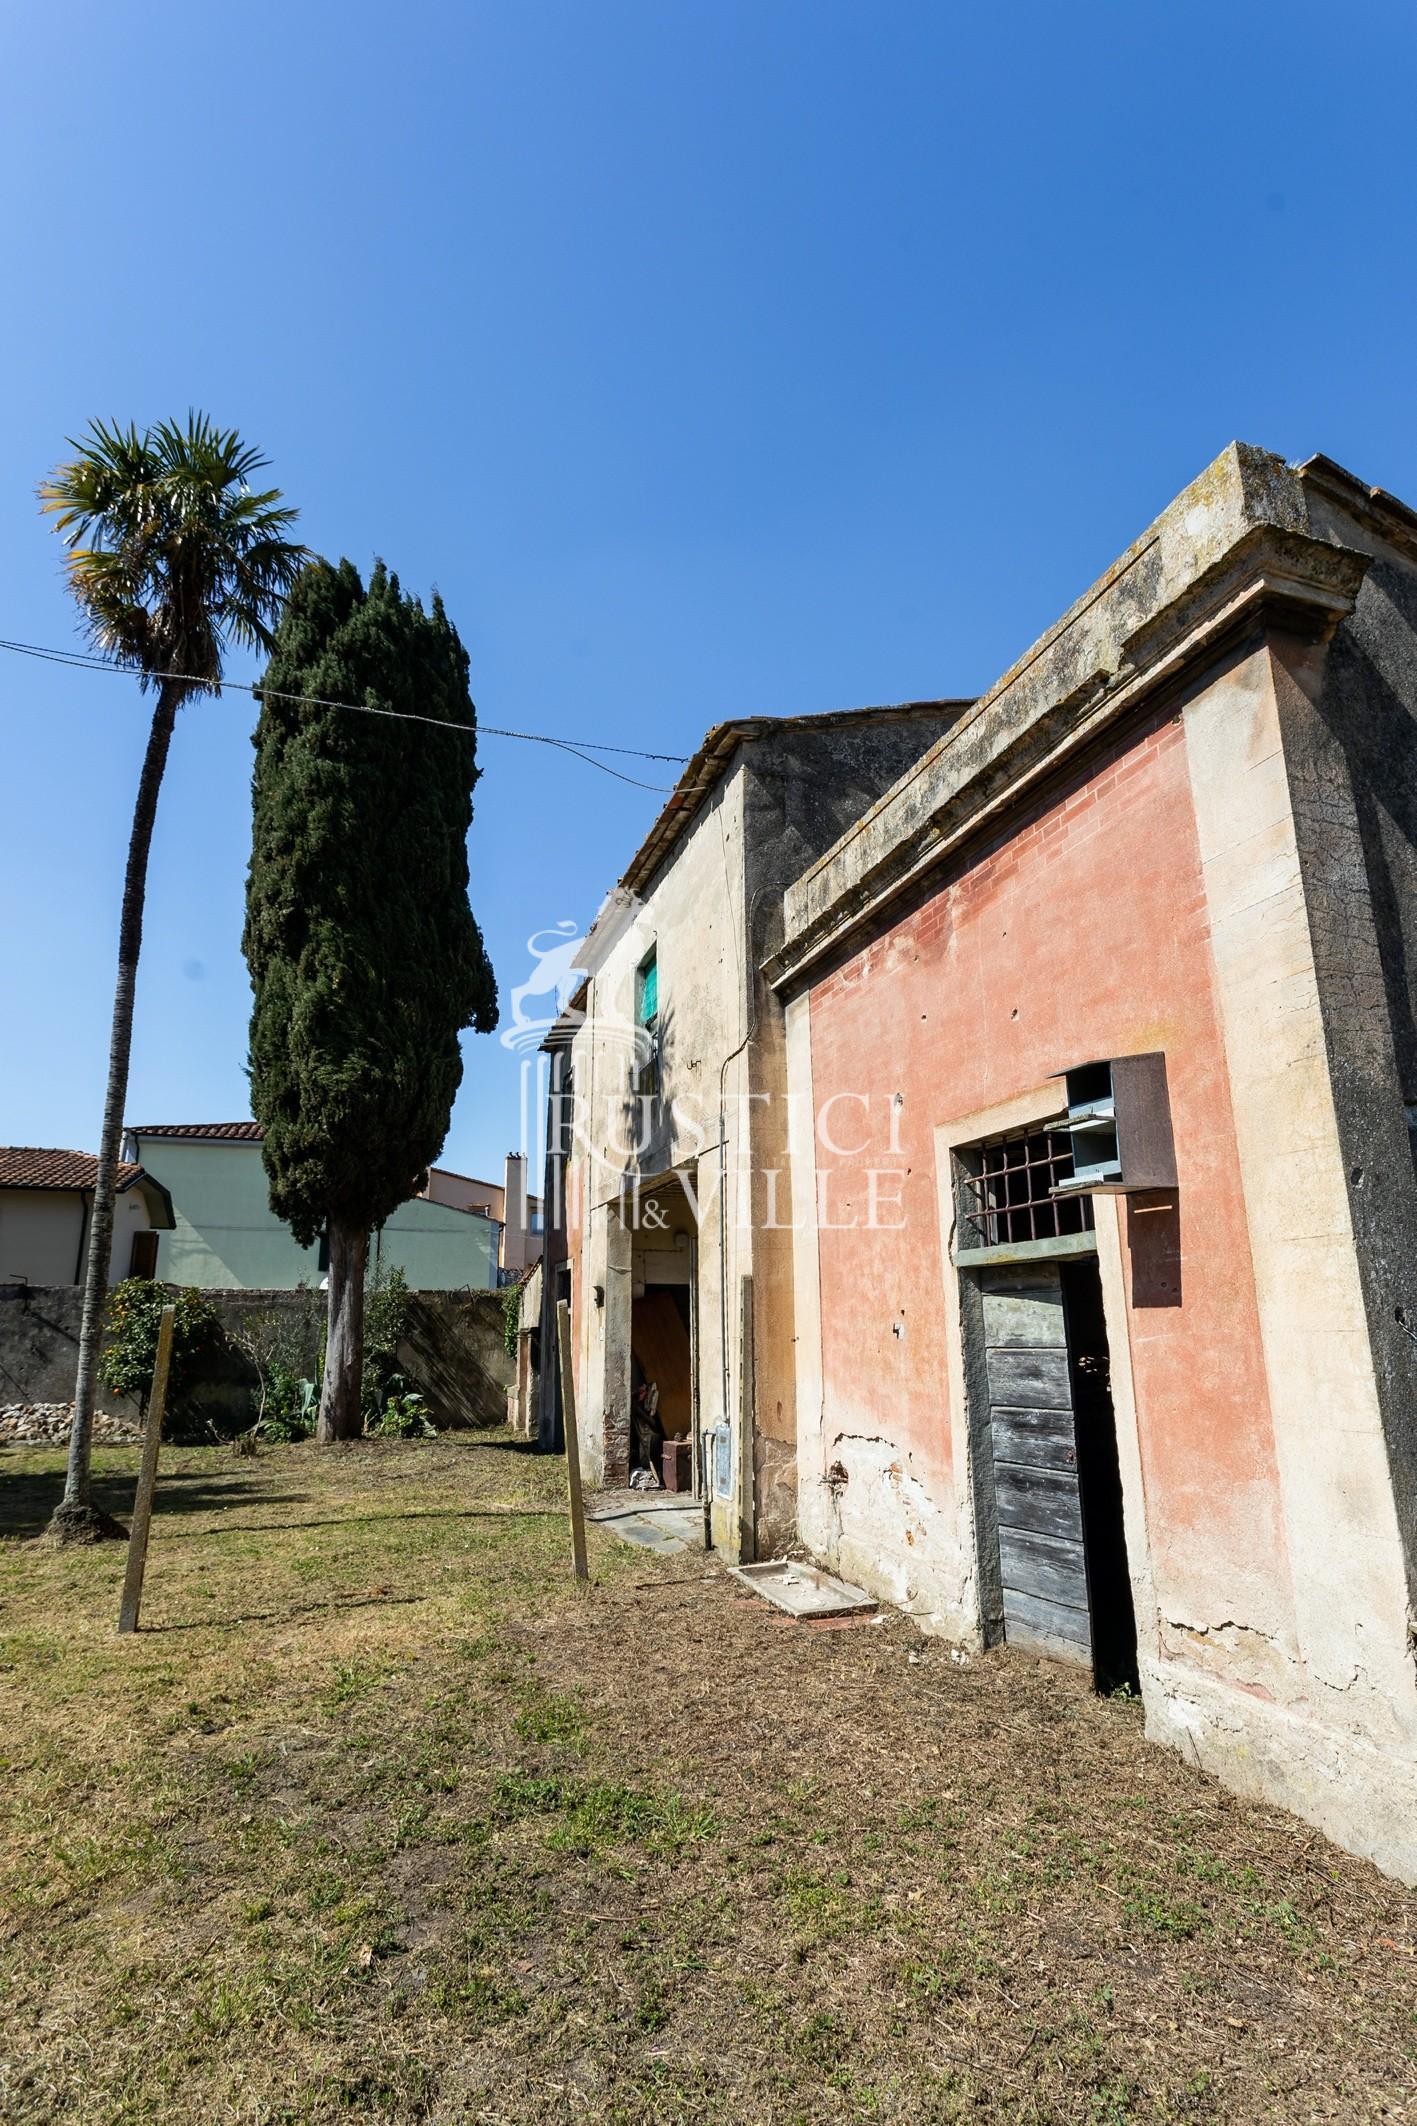 Edificio storico in vendita a San Giuliano Terme (74/81)